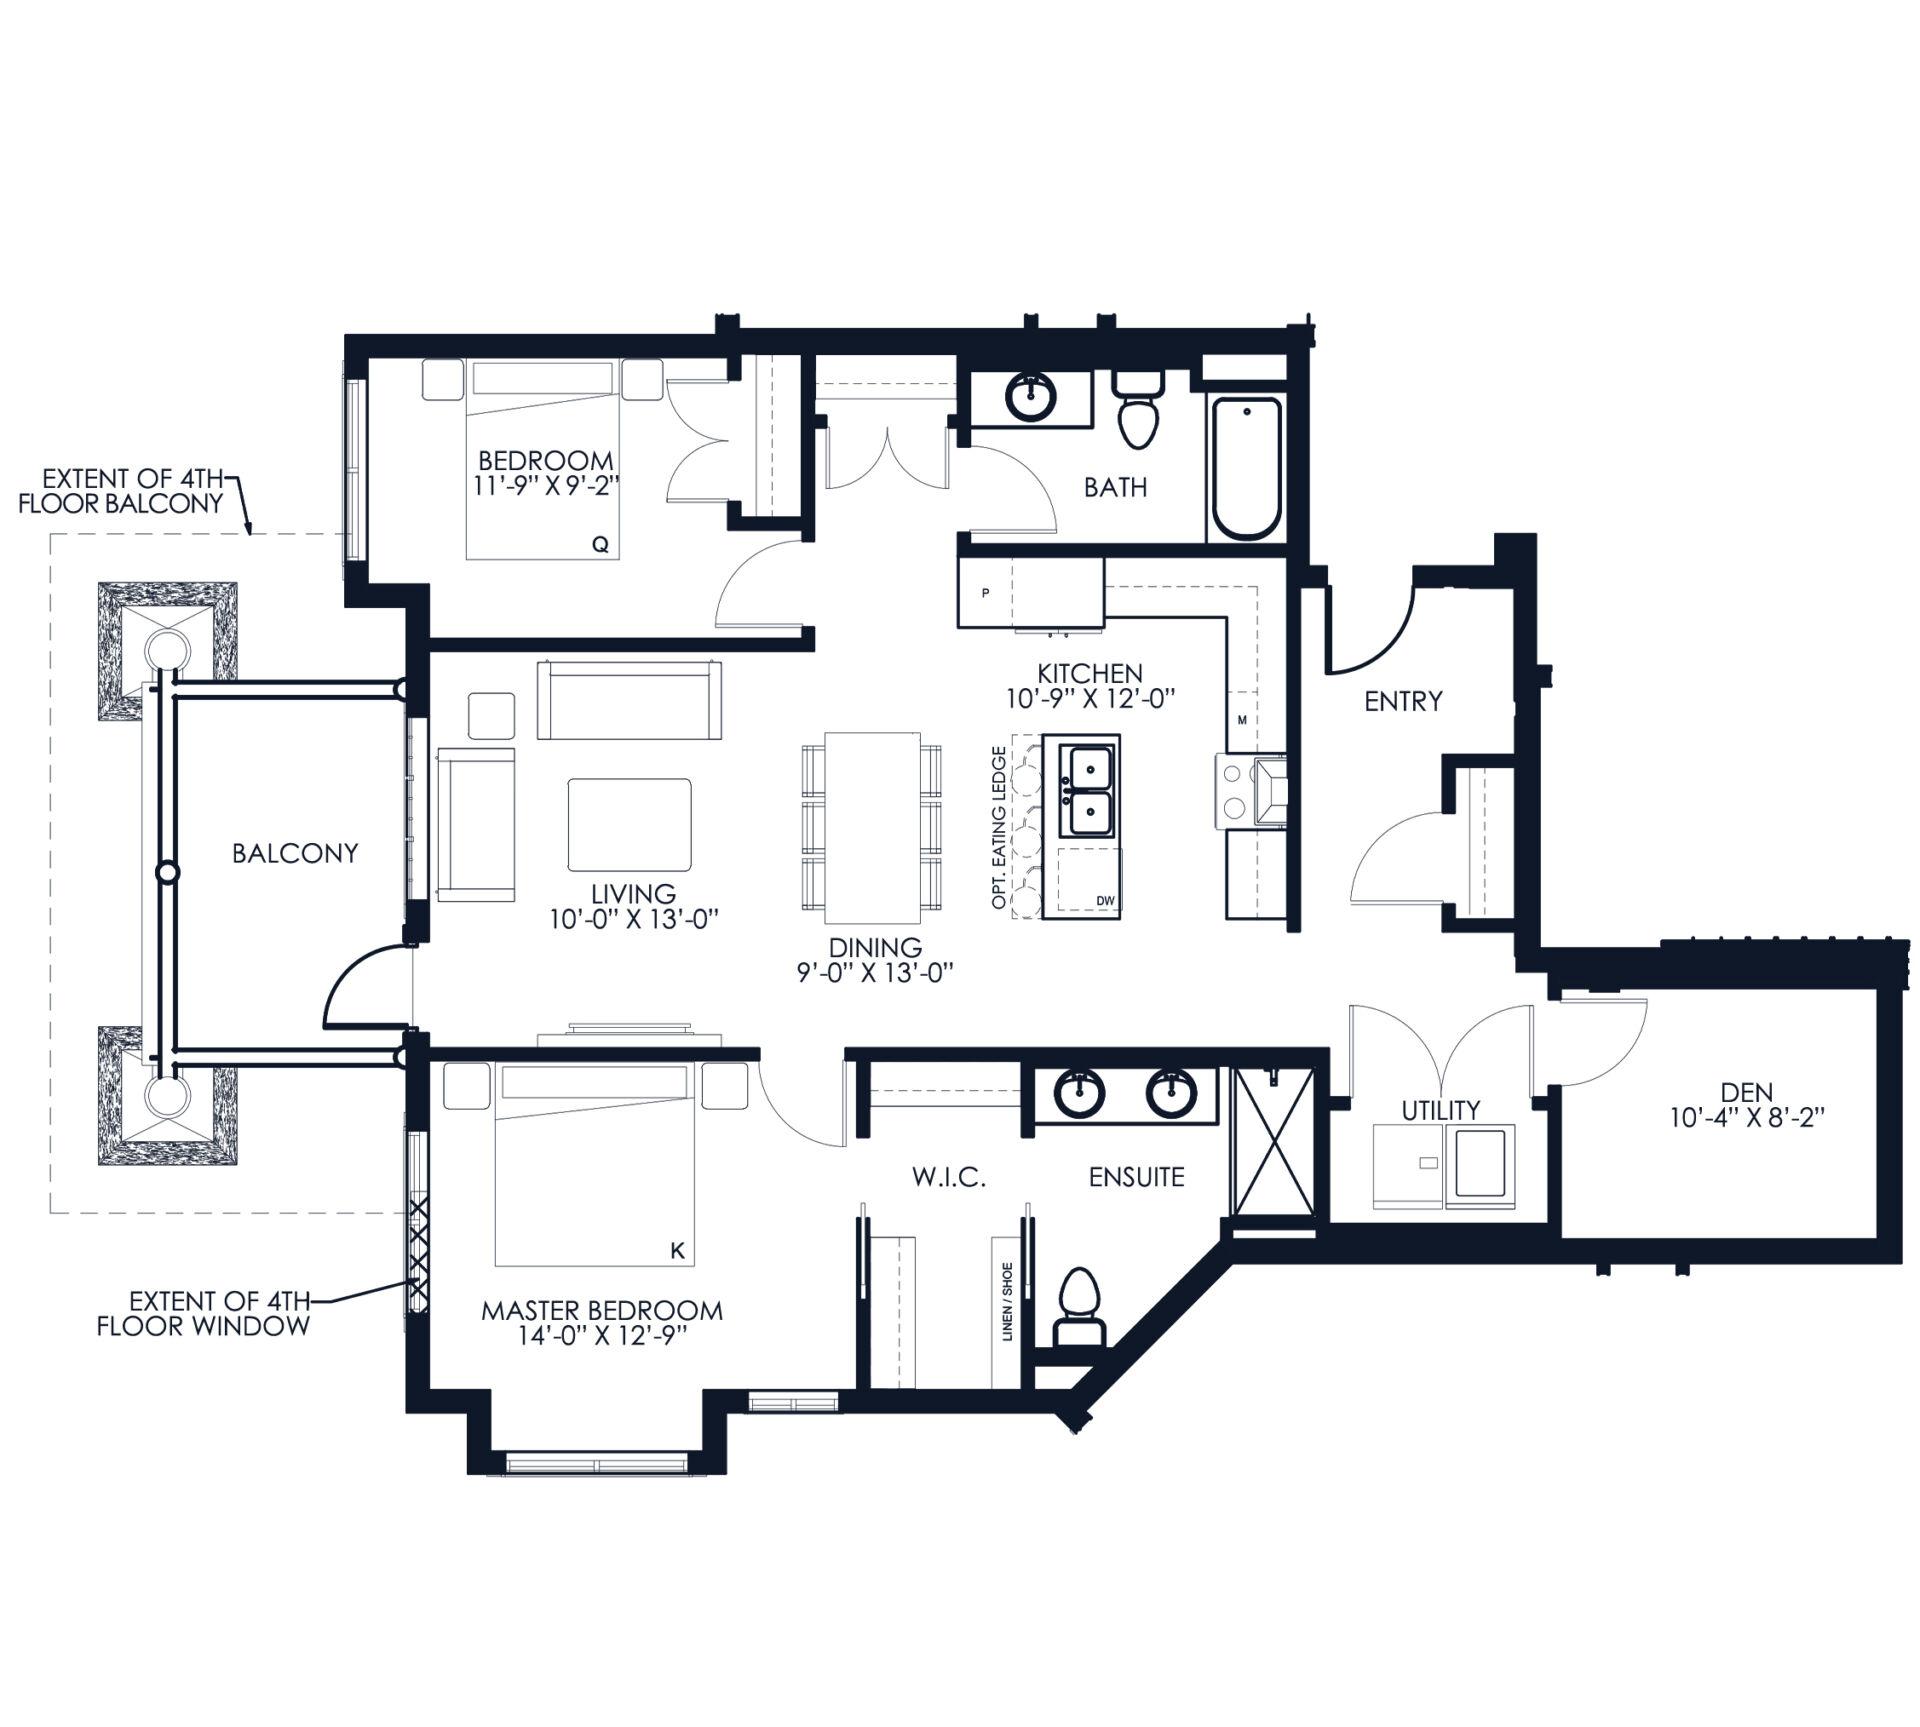 Unit F104 floor plan